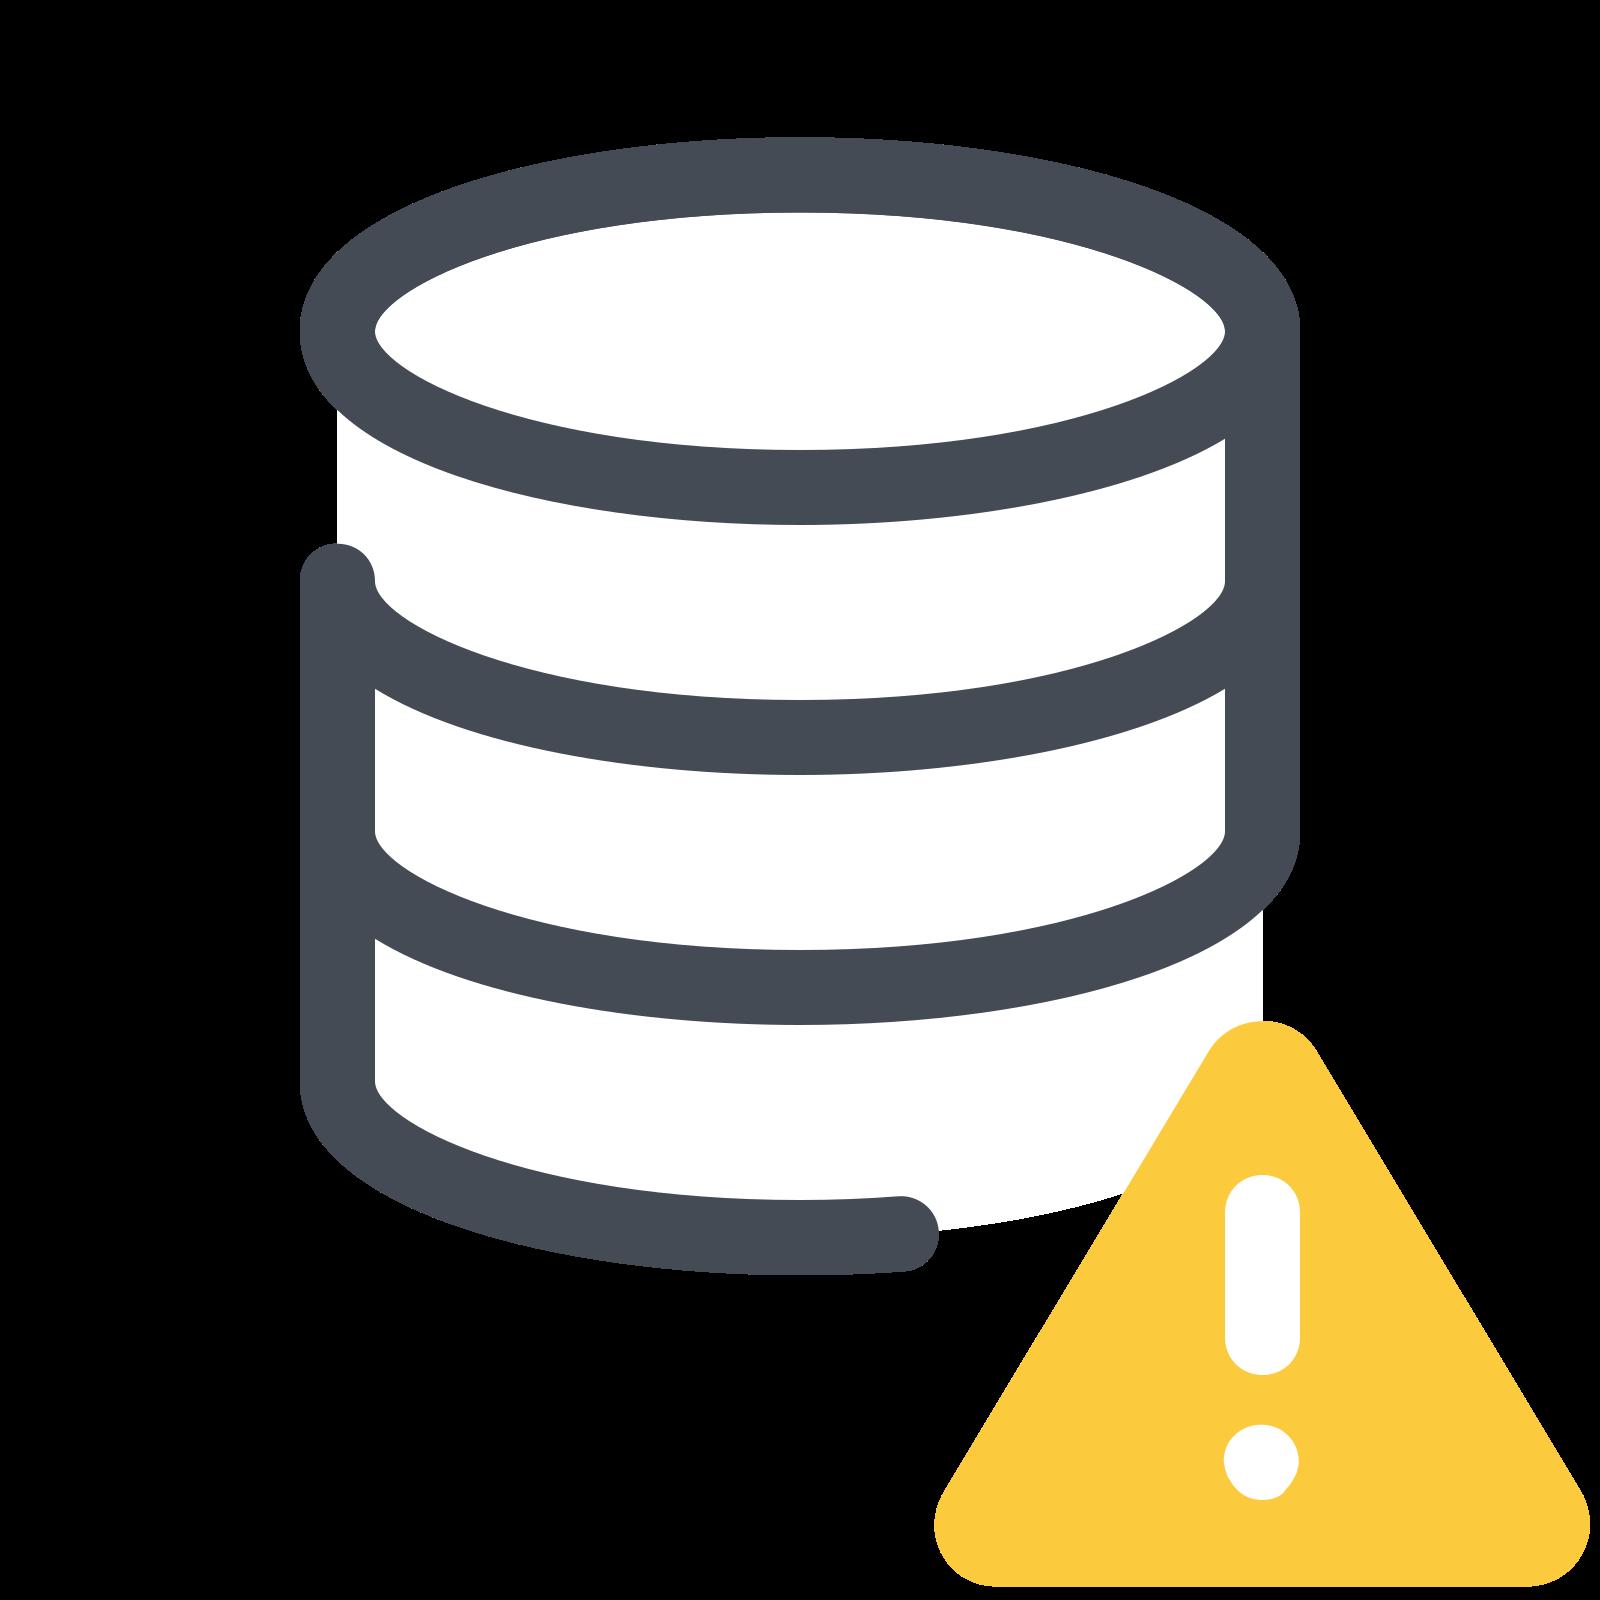 Database Error icon